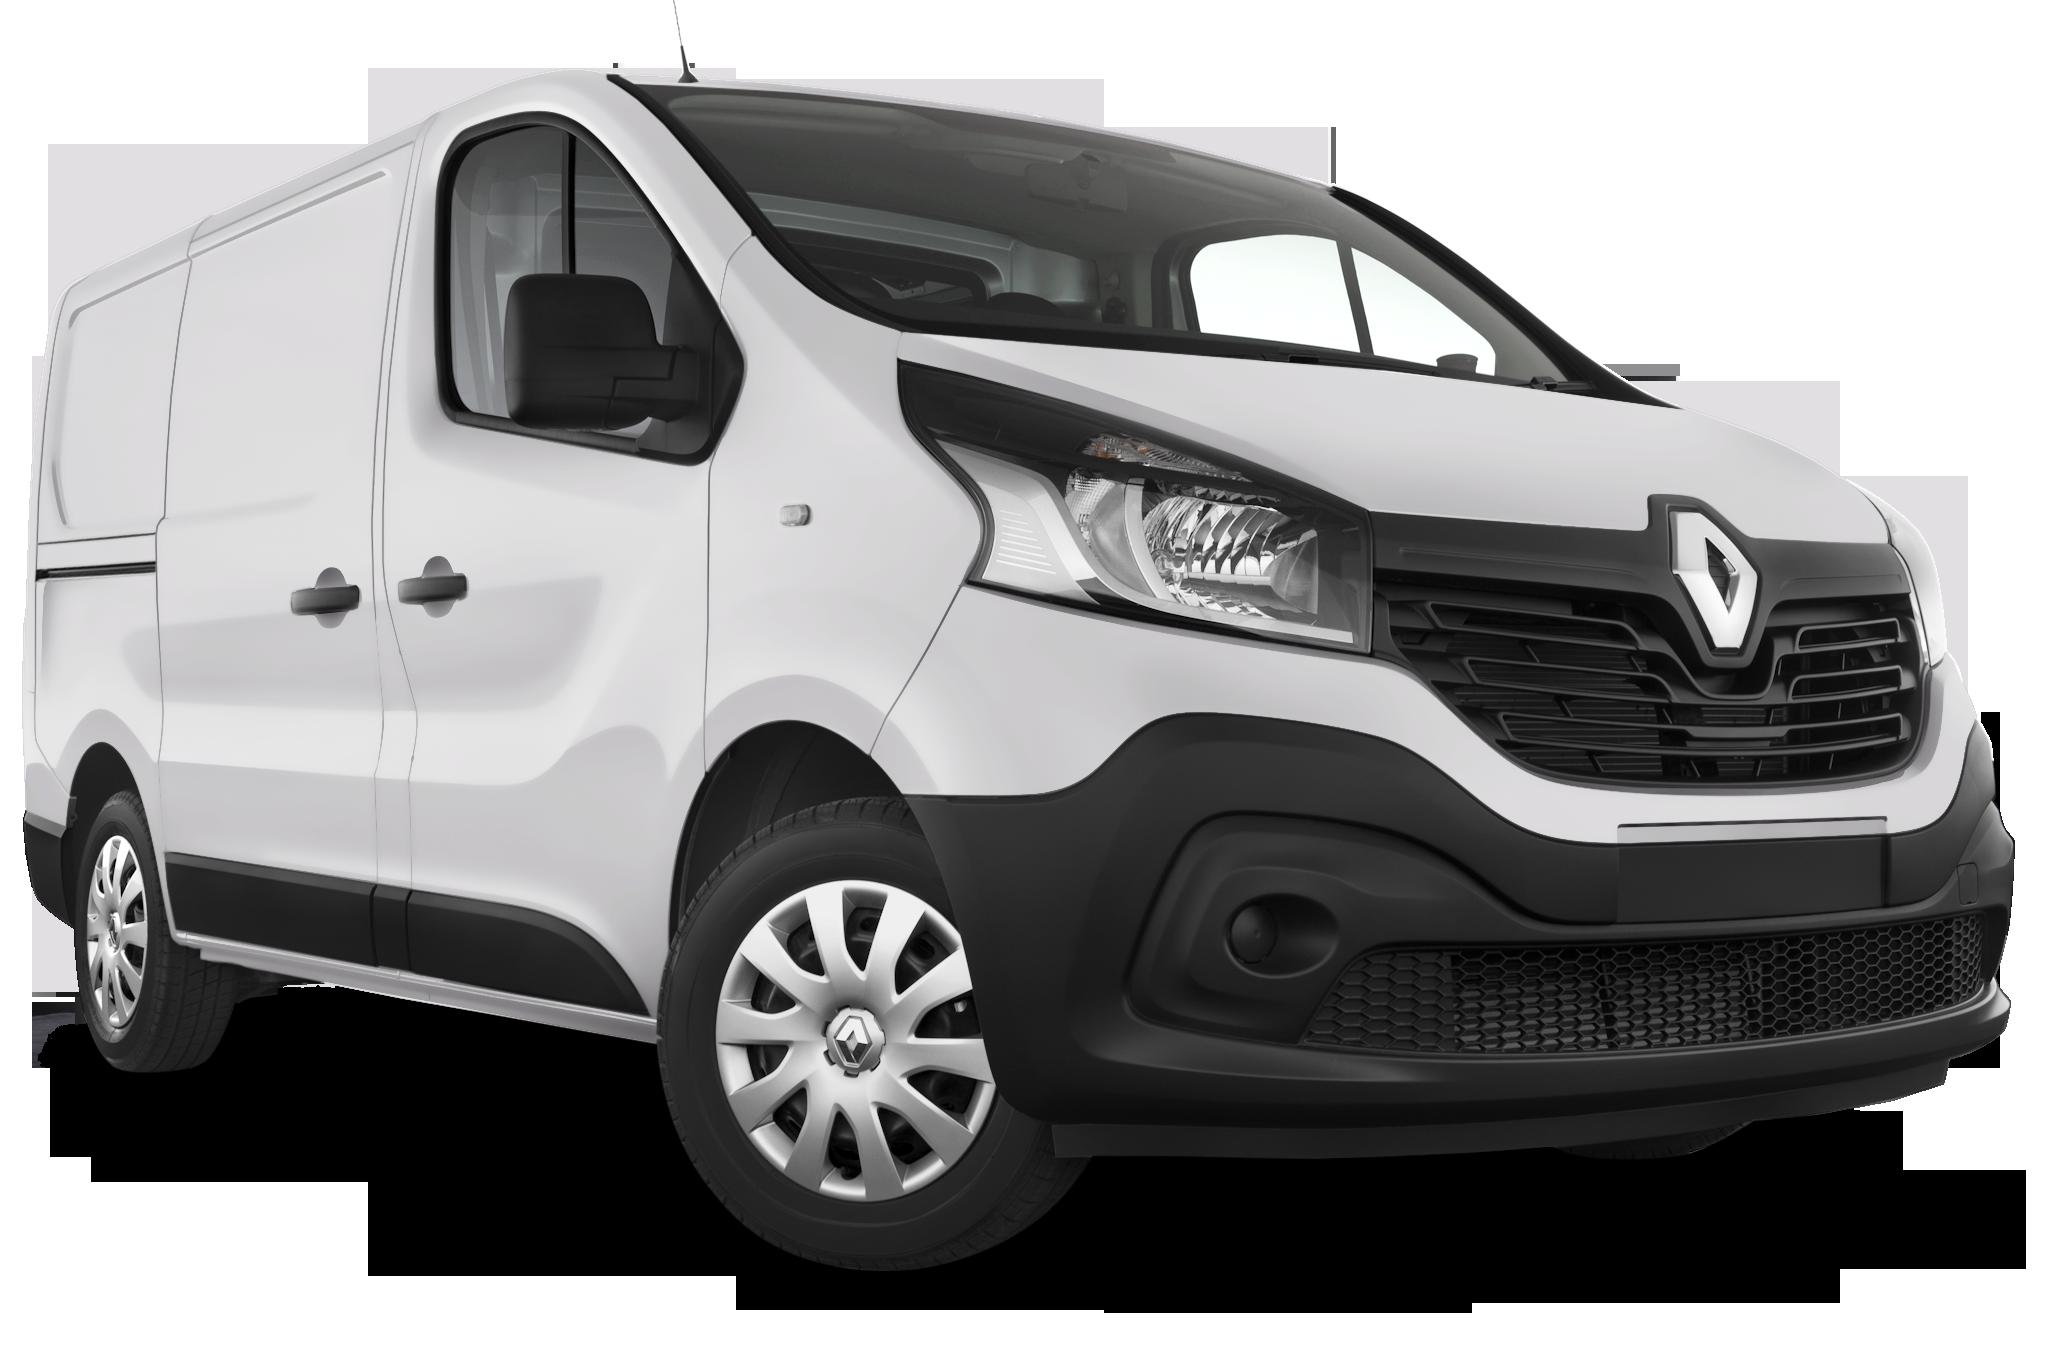 Minivan clipart transparent background. Renault png image purepng